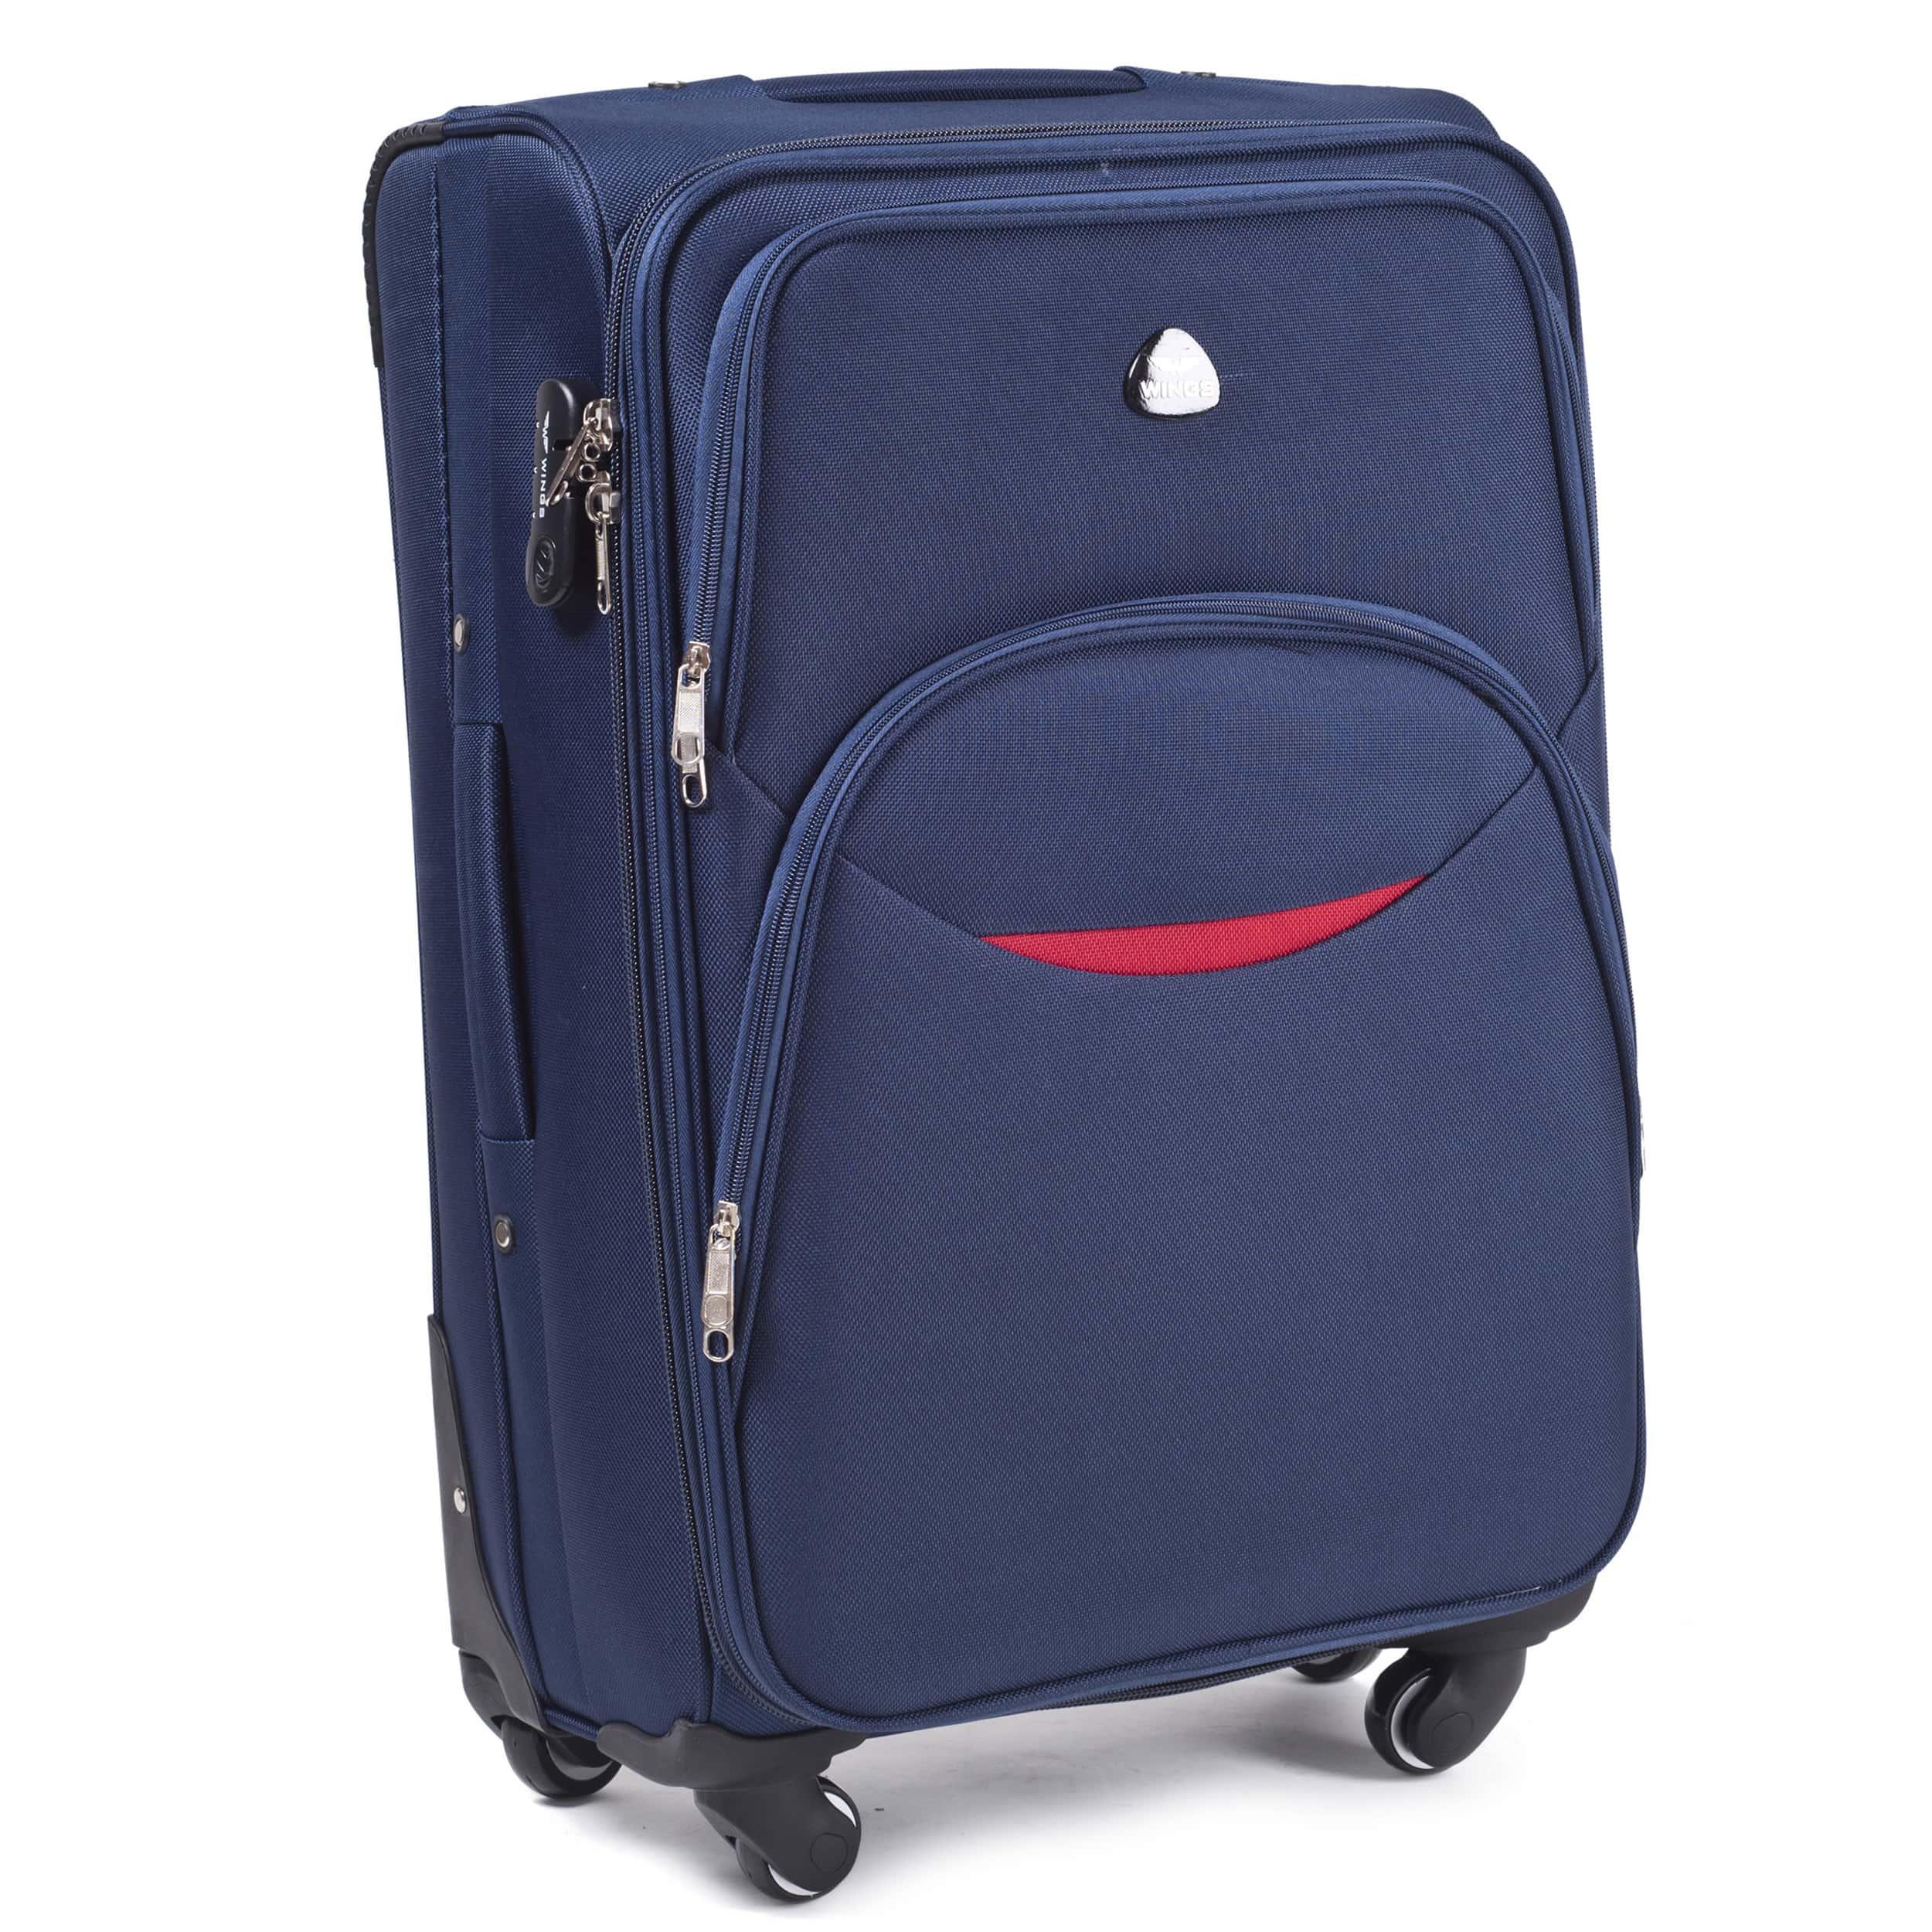 Большой Тканевый Чемодан Wings 1708-4 L D.Blue PREMIUM на 4-х прочных колесах! Для багажа,до 23 кг